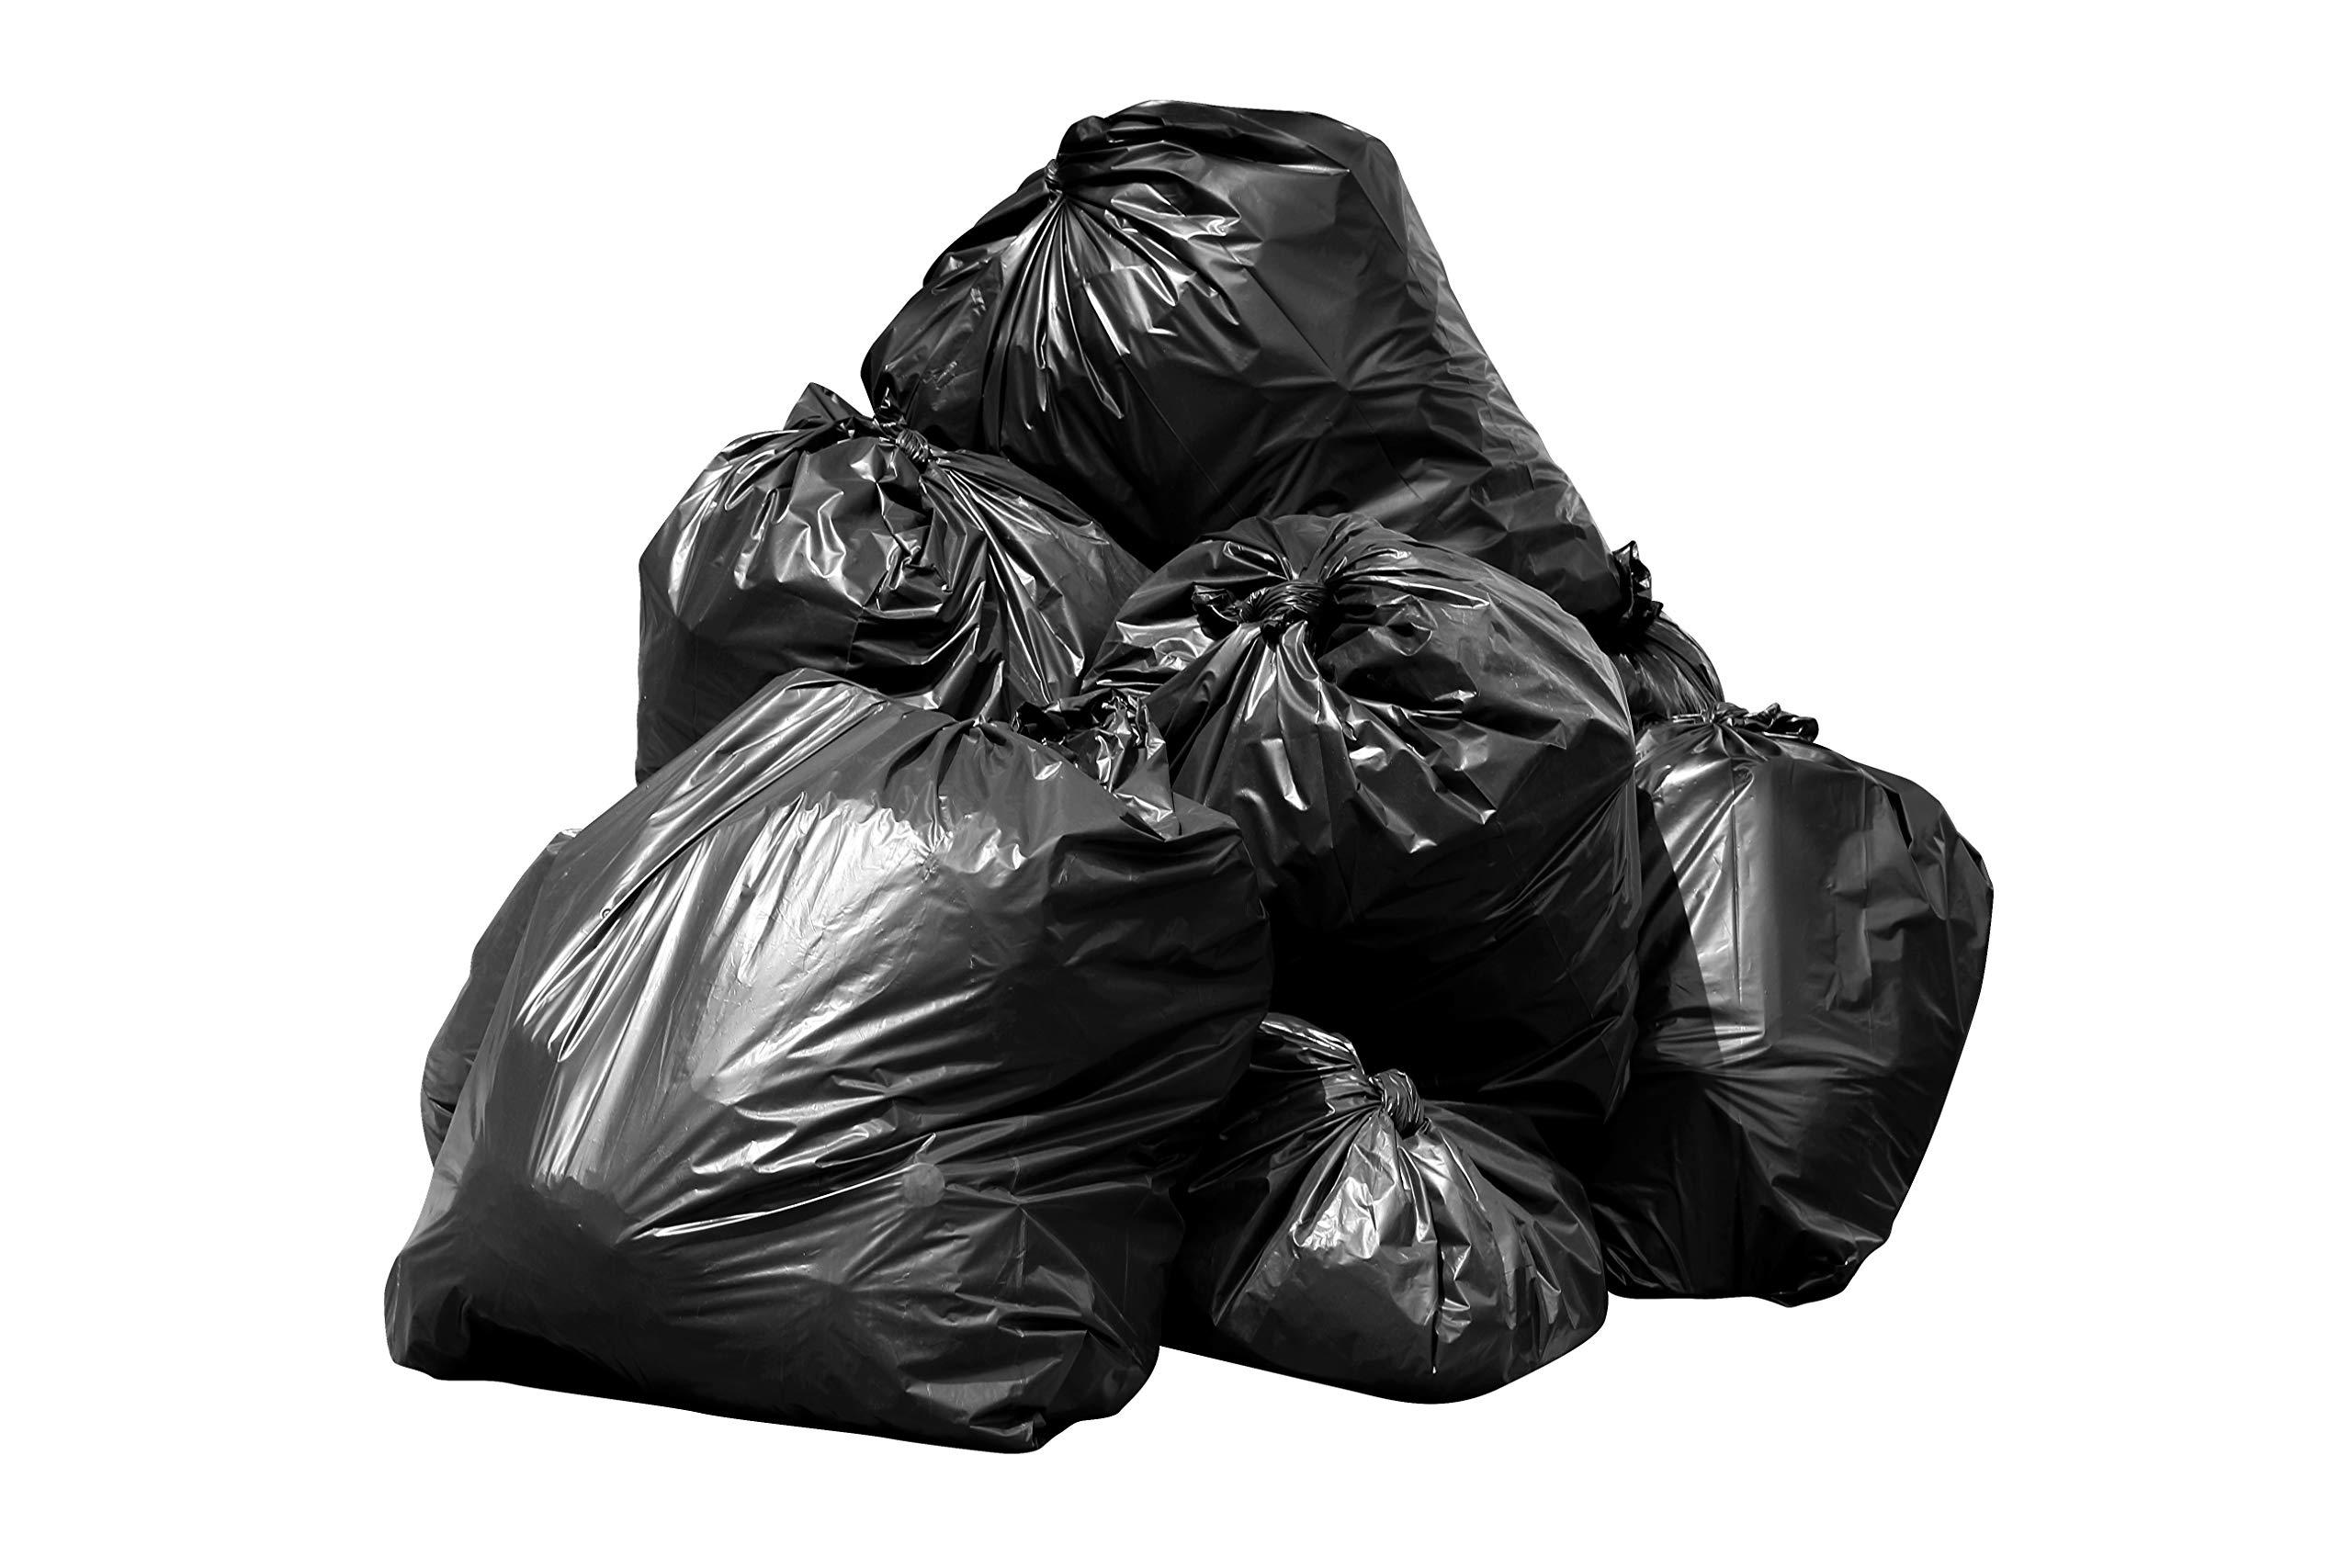 Toughbag 95 Gal Trash bags, Black, 2 Mil, 61x68, 25 Garbage Bags Per Case by ToughBag (Image #9)